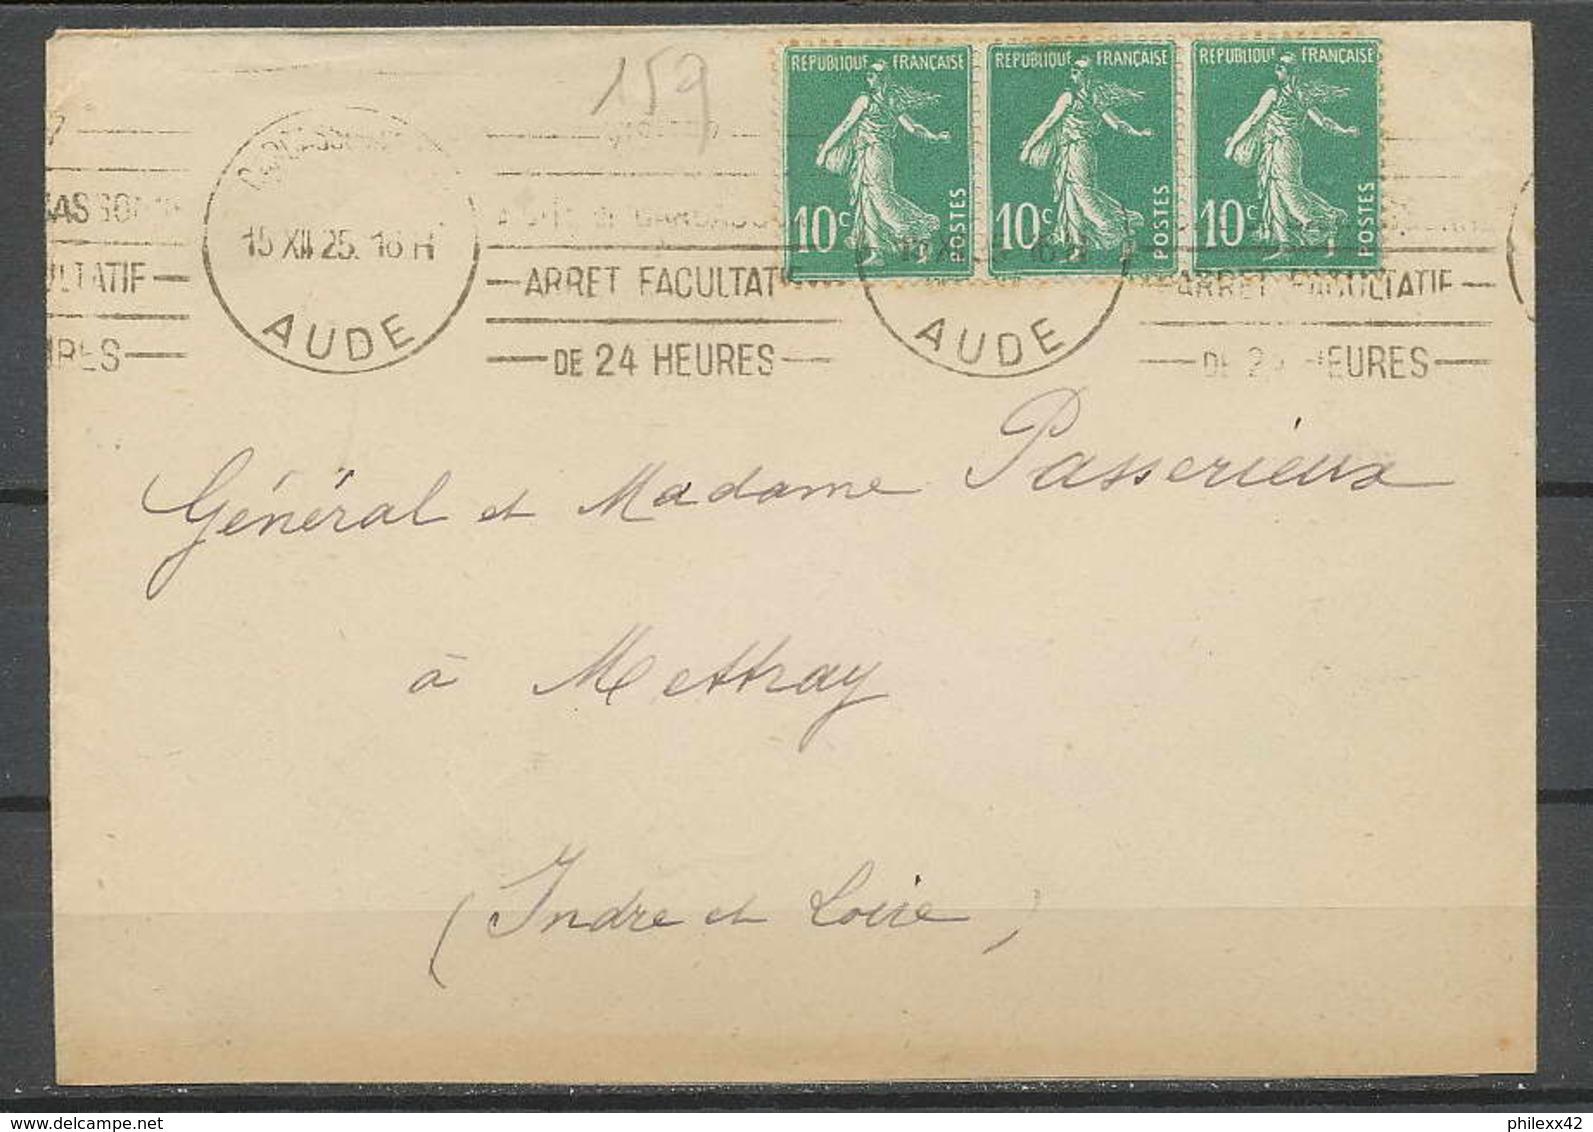 1502 Lettre (cover) N°159 10c Vert Semeuse Bande 3 X3 KRAG 12/12/1925 Aude Pour Meythet Indre Et Loire - Postmark Collection (Covers)